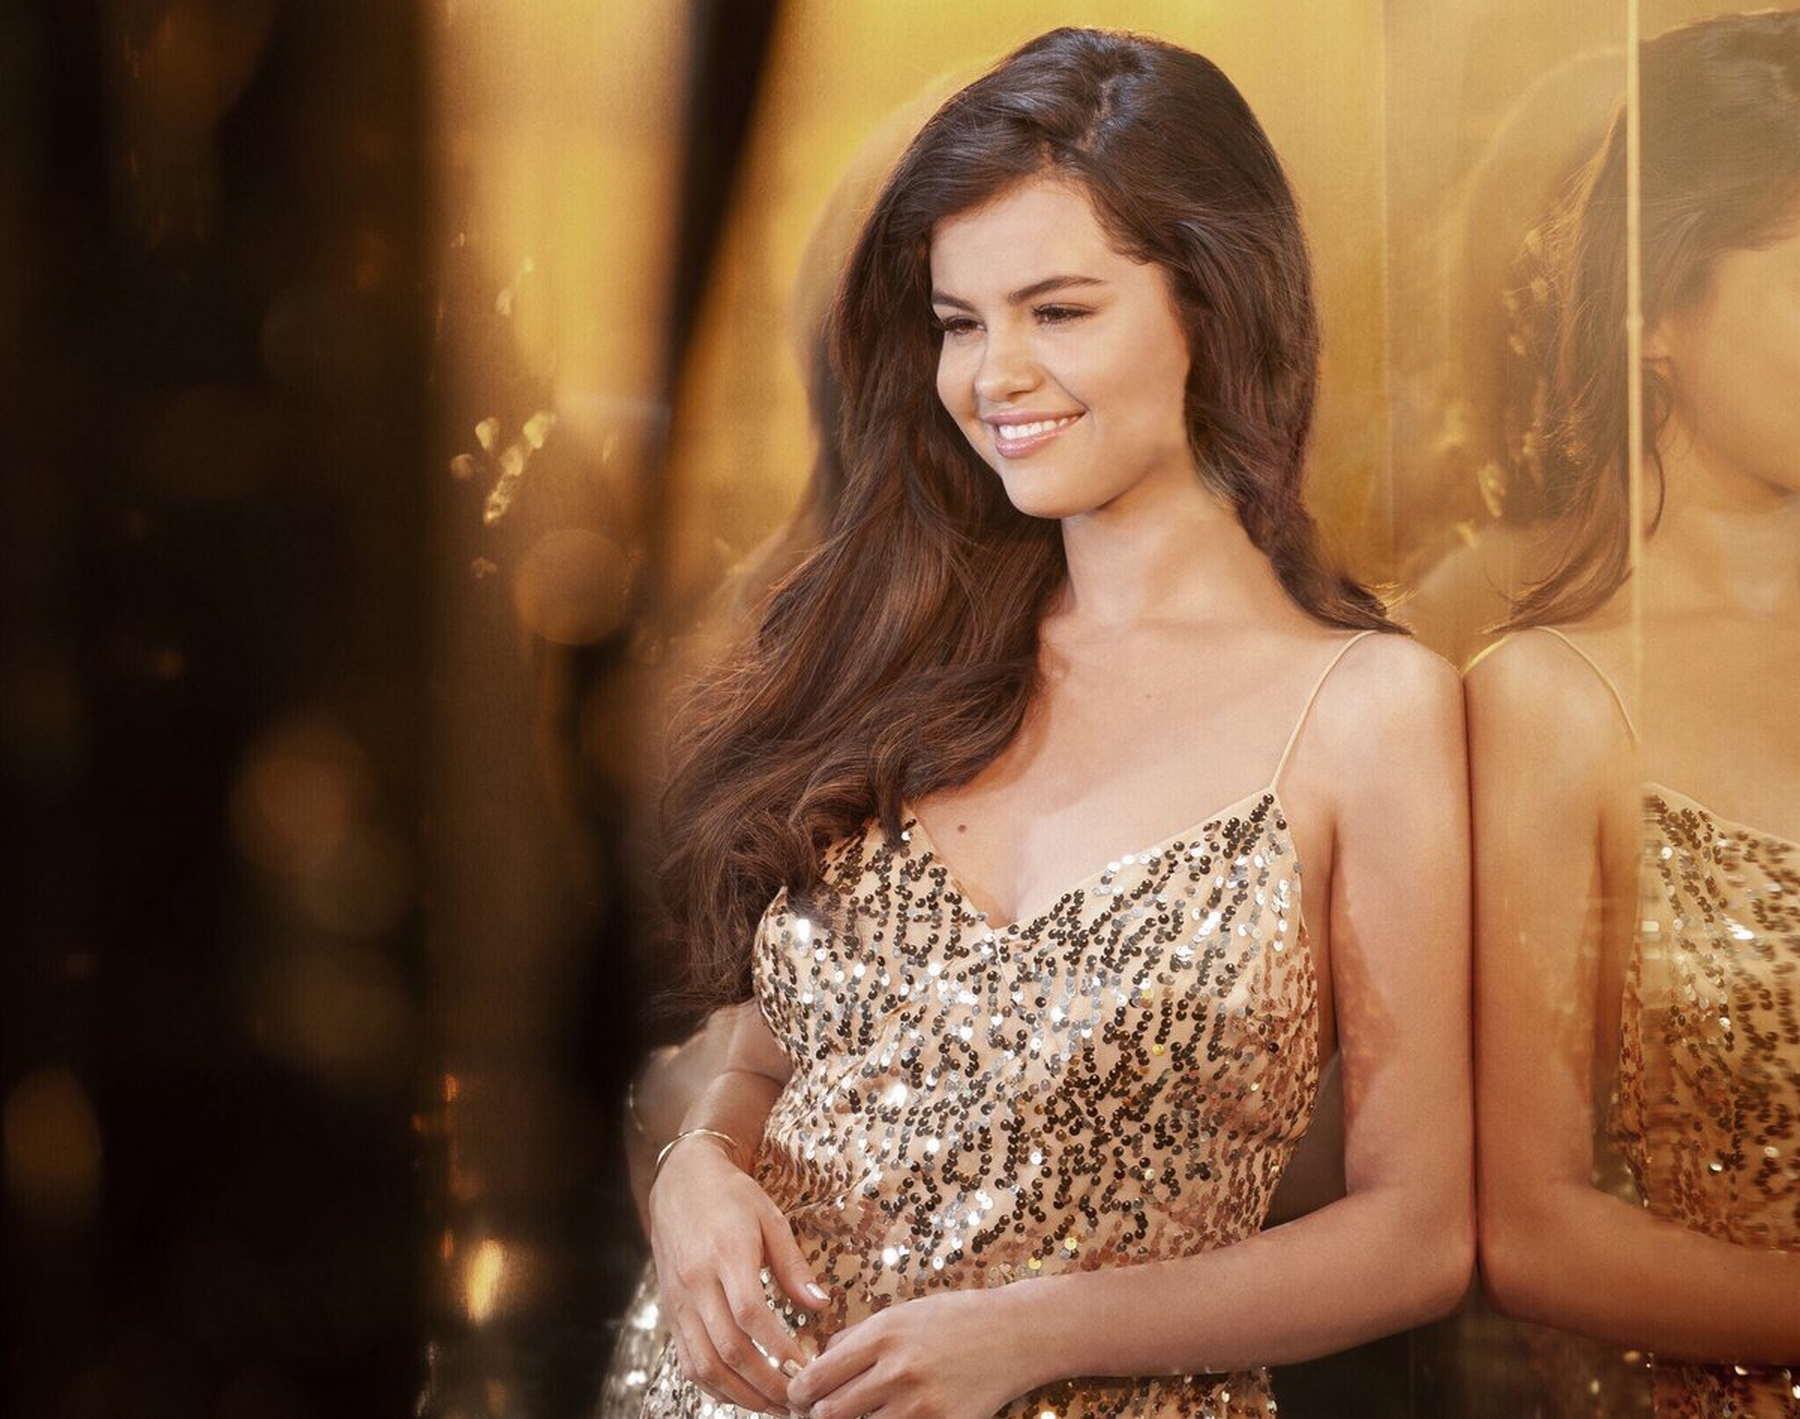 where-to-get-selena-gomez-gold-sequin-dress-pantene-advert-jauary-2019-v2